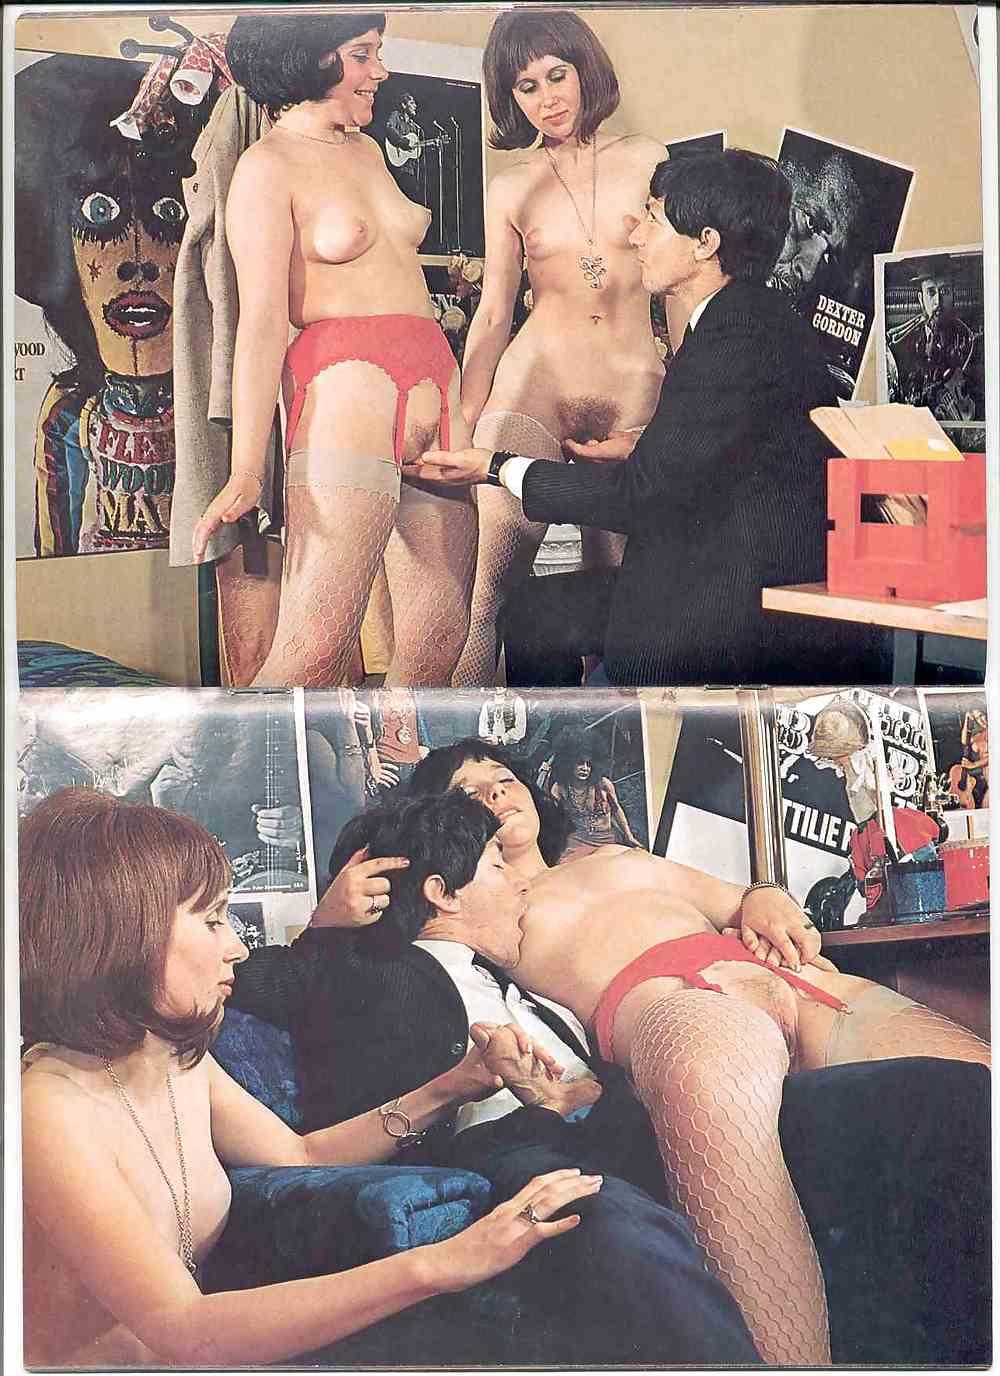 Free desi porn magazine, zombie slave